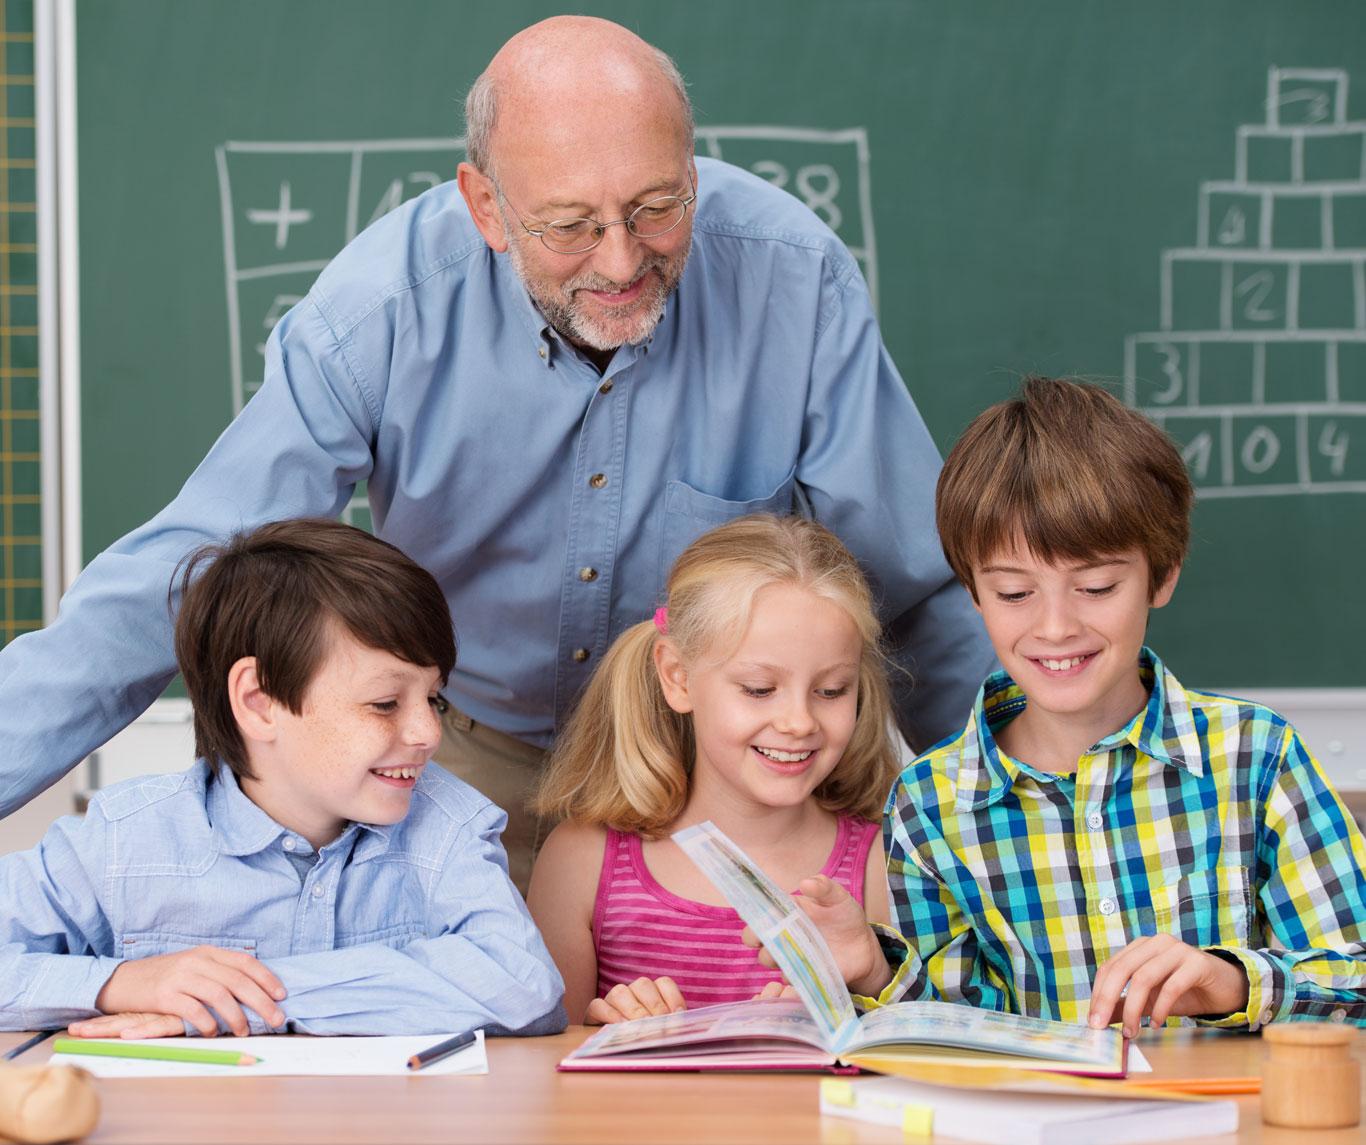 Senior-Citizen-Mentoring-Students-1366-0818